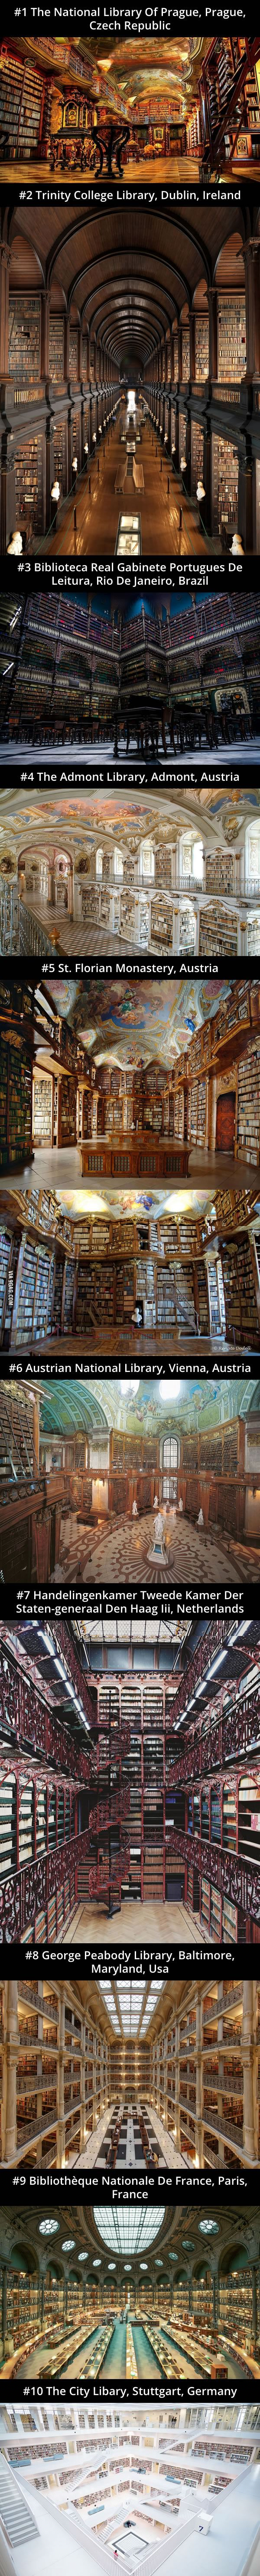 Library porn #aroundtheworldtrips